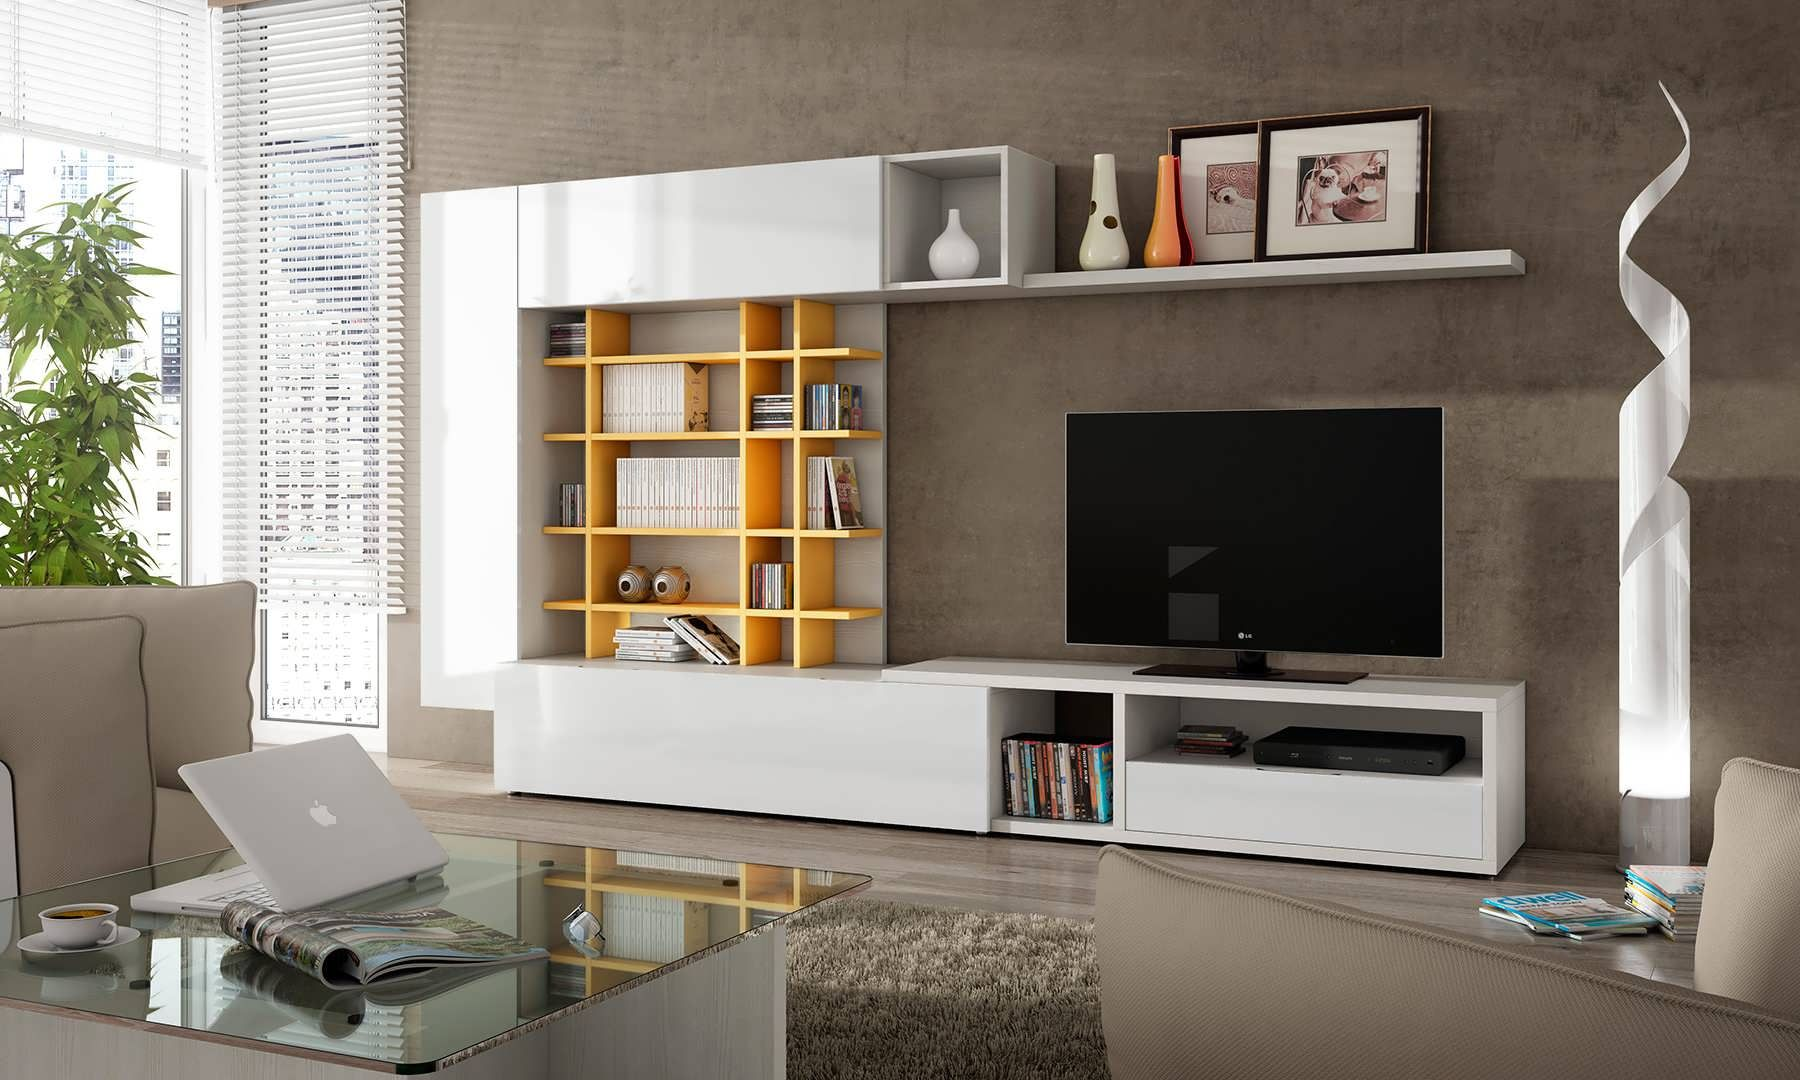 Muebles para salon baratos ikea y muebles salon modernos for Muebles baratos com